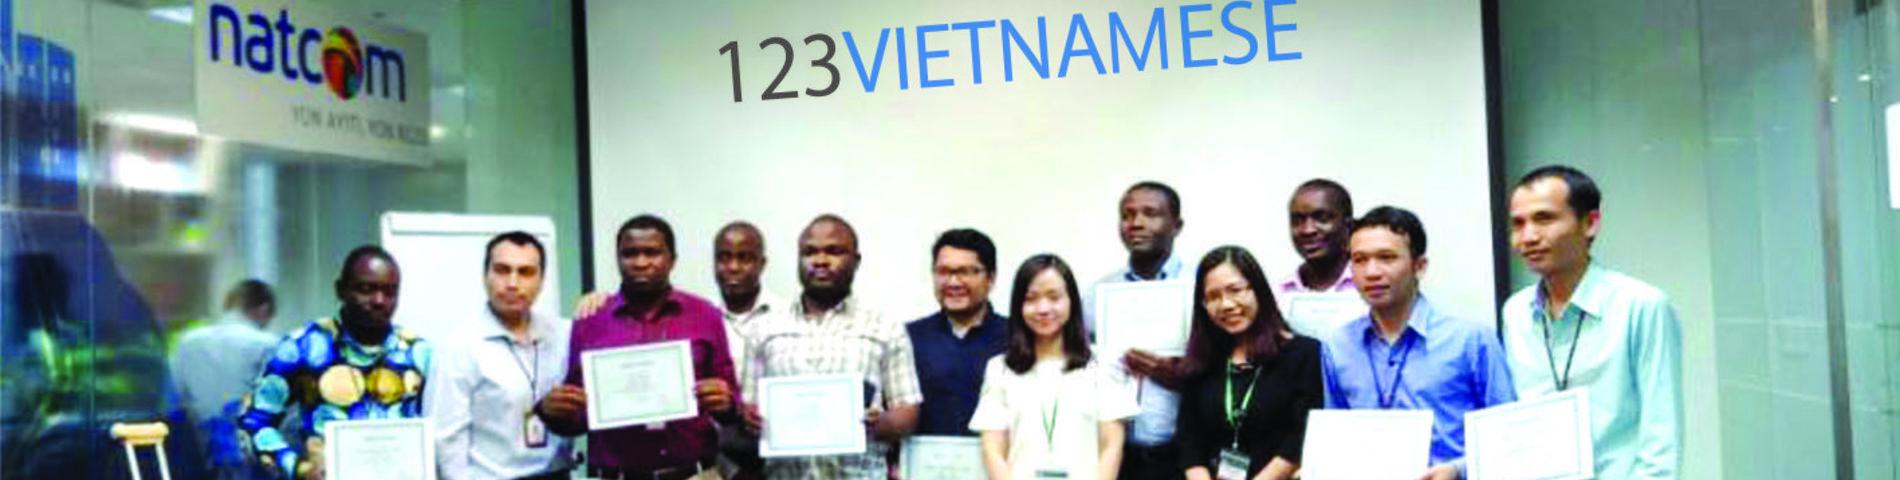 123 Vietnamese Center 사진 1